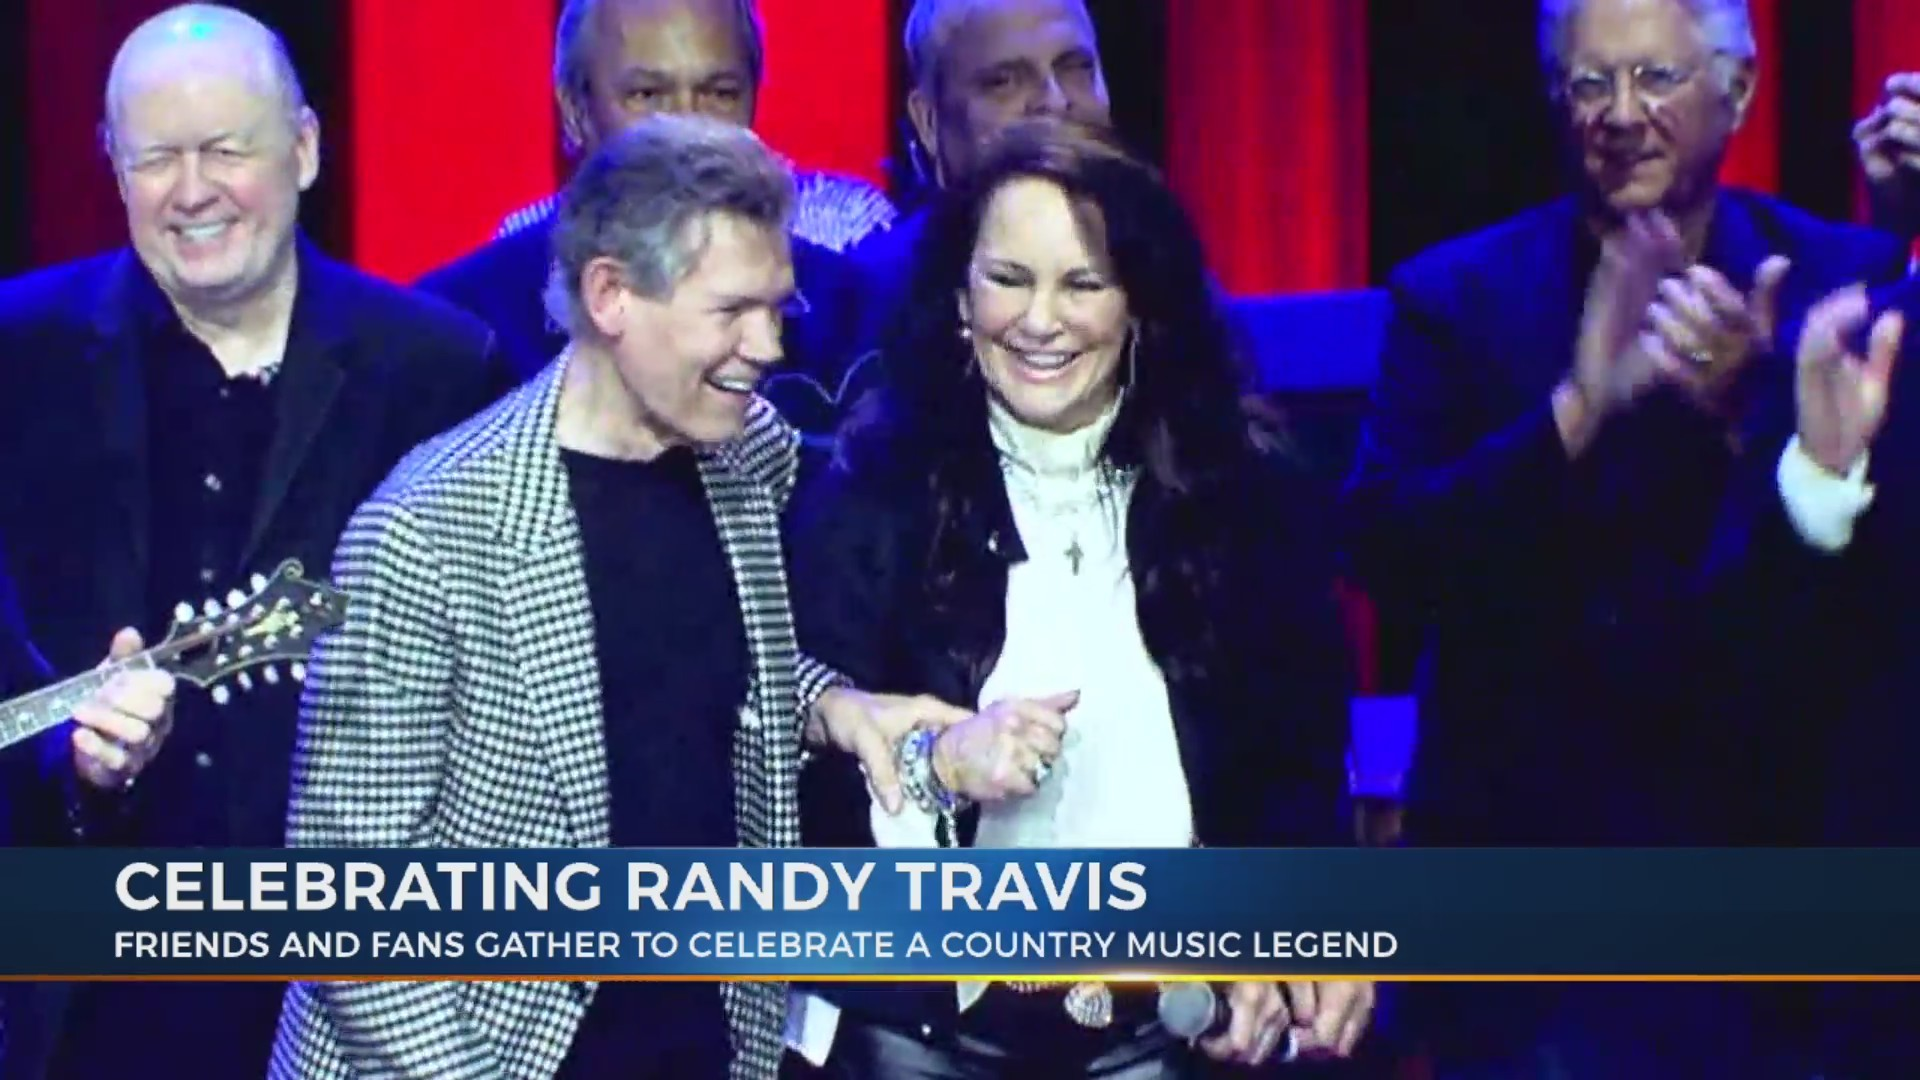 Randy_Travis_Birthday_at_the_Opry_0_20190505041334